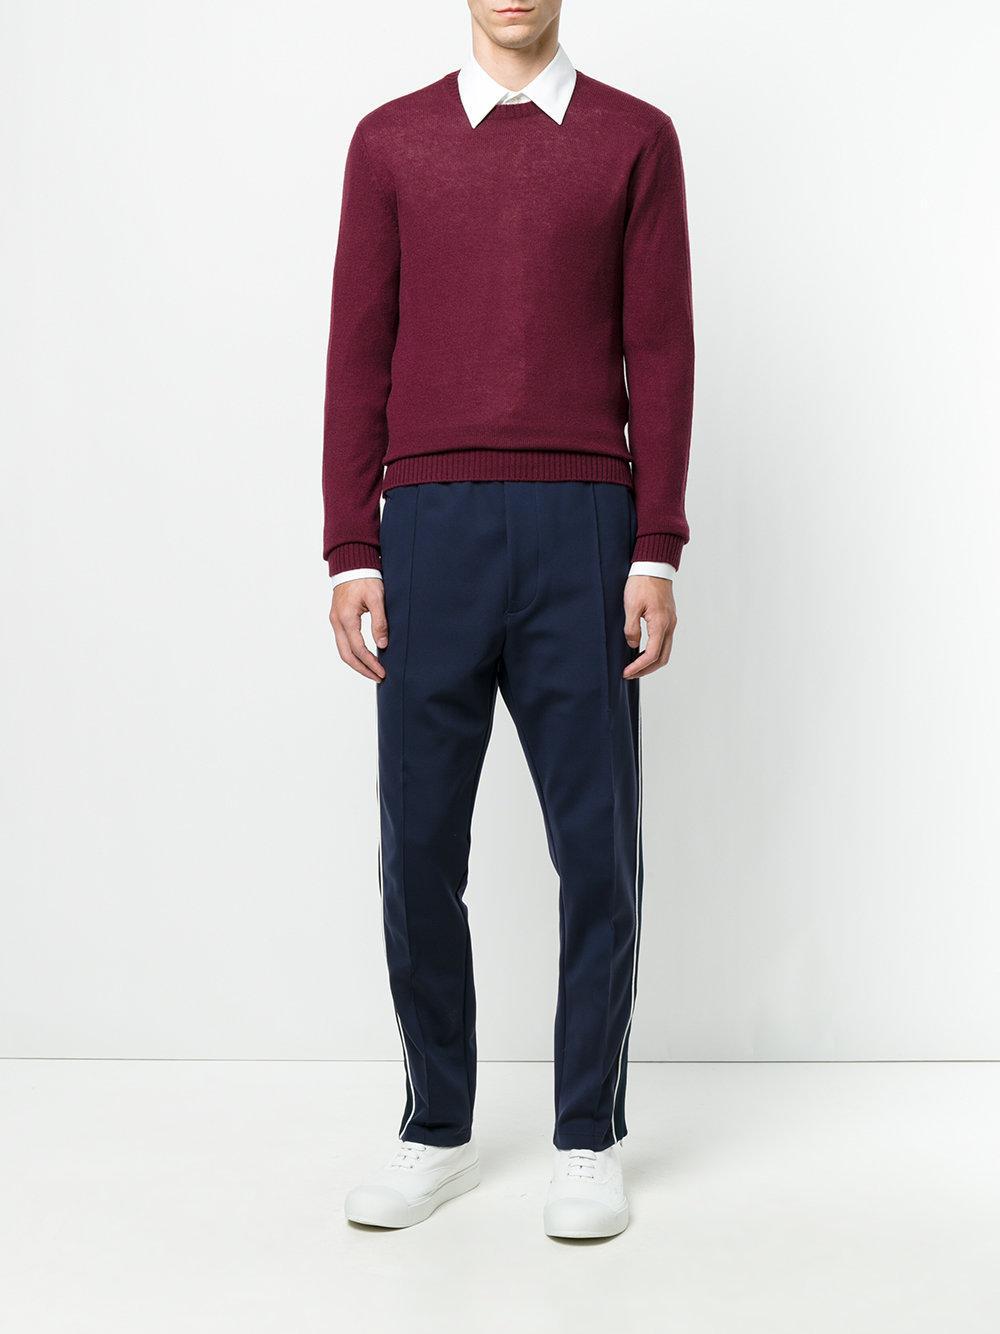 Prada Cashmere Crew Neck Sweater in Red for Men